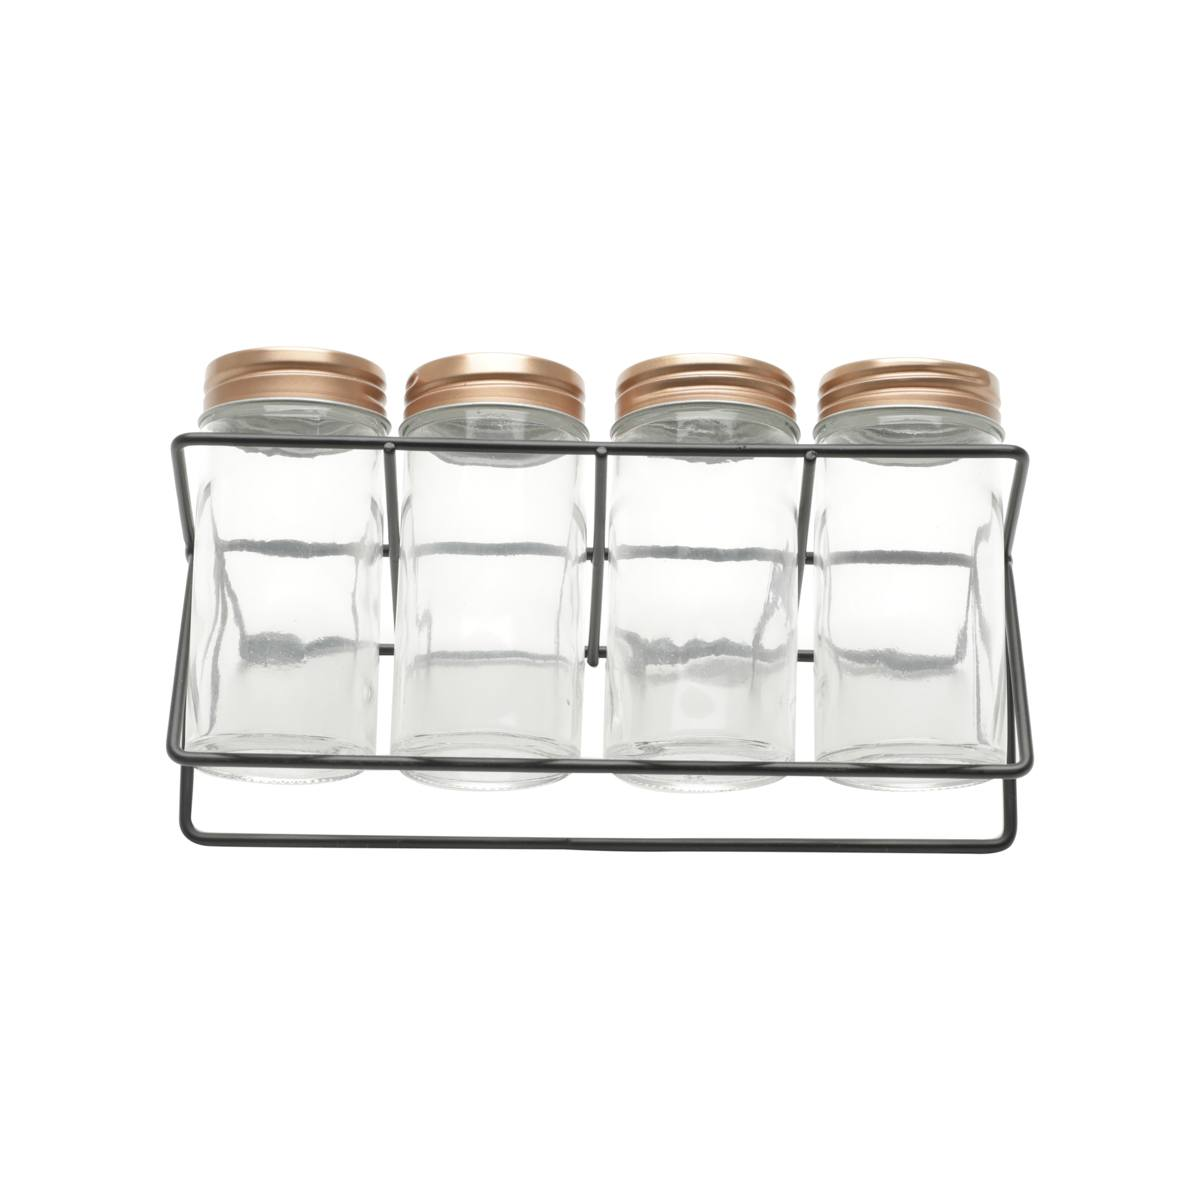 Set 4 porta temperos vidro cobre suporte metal preto Urban